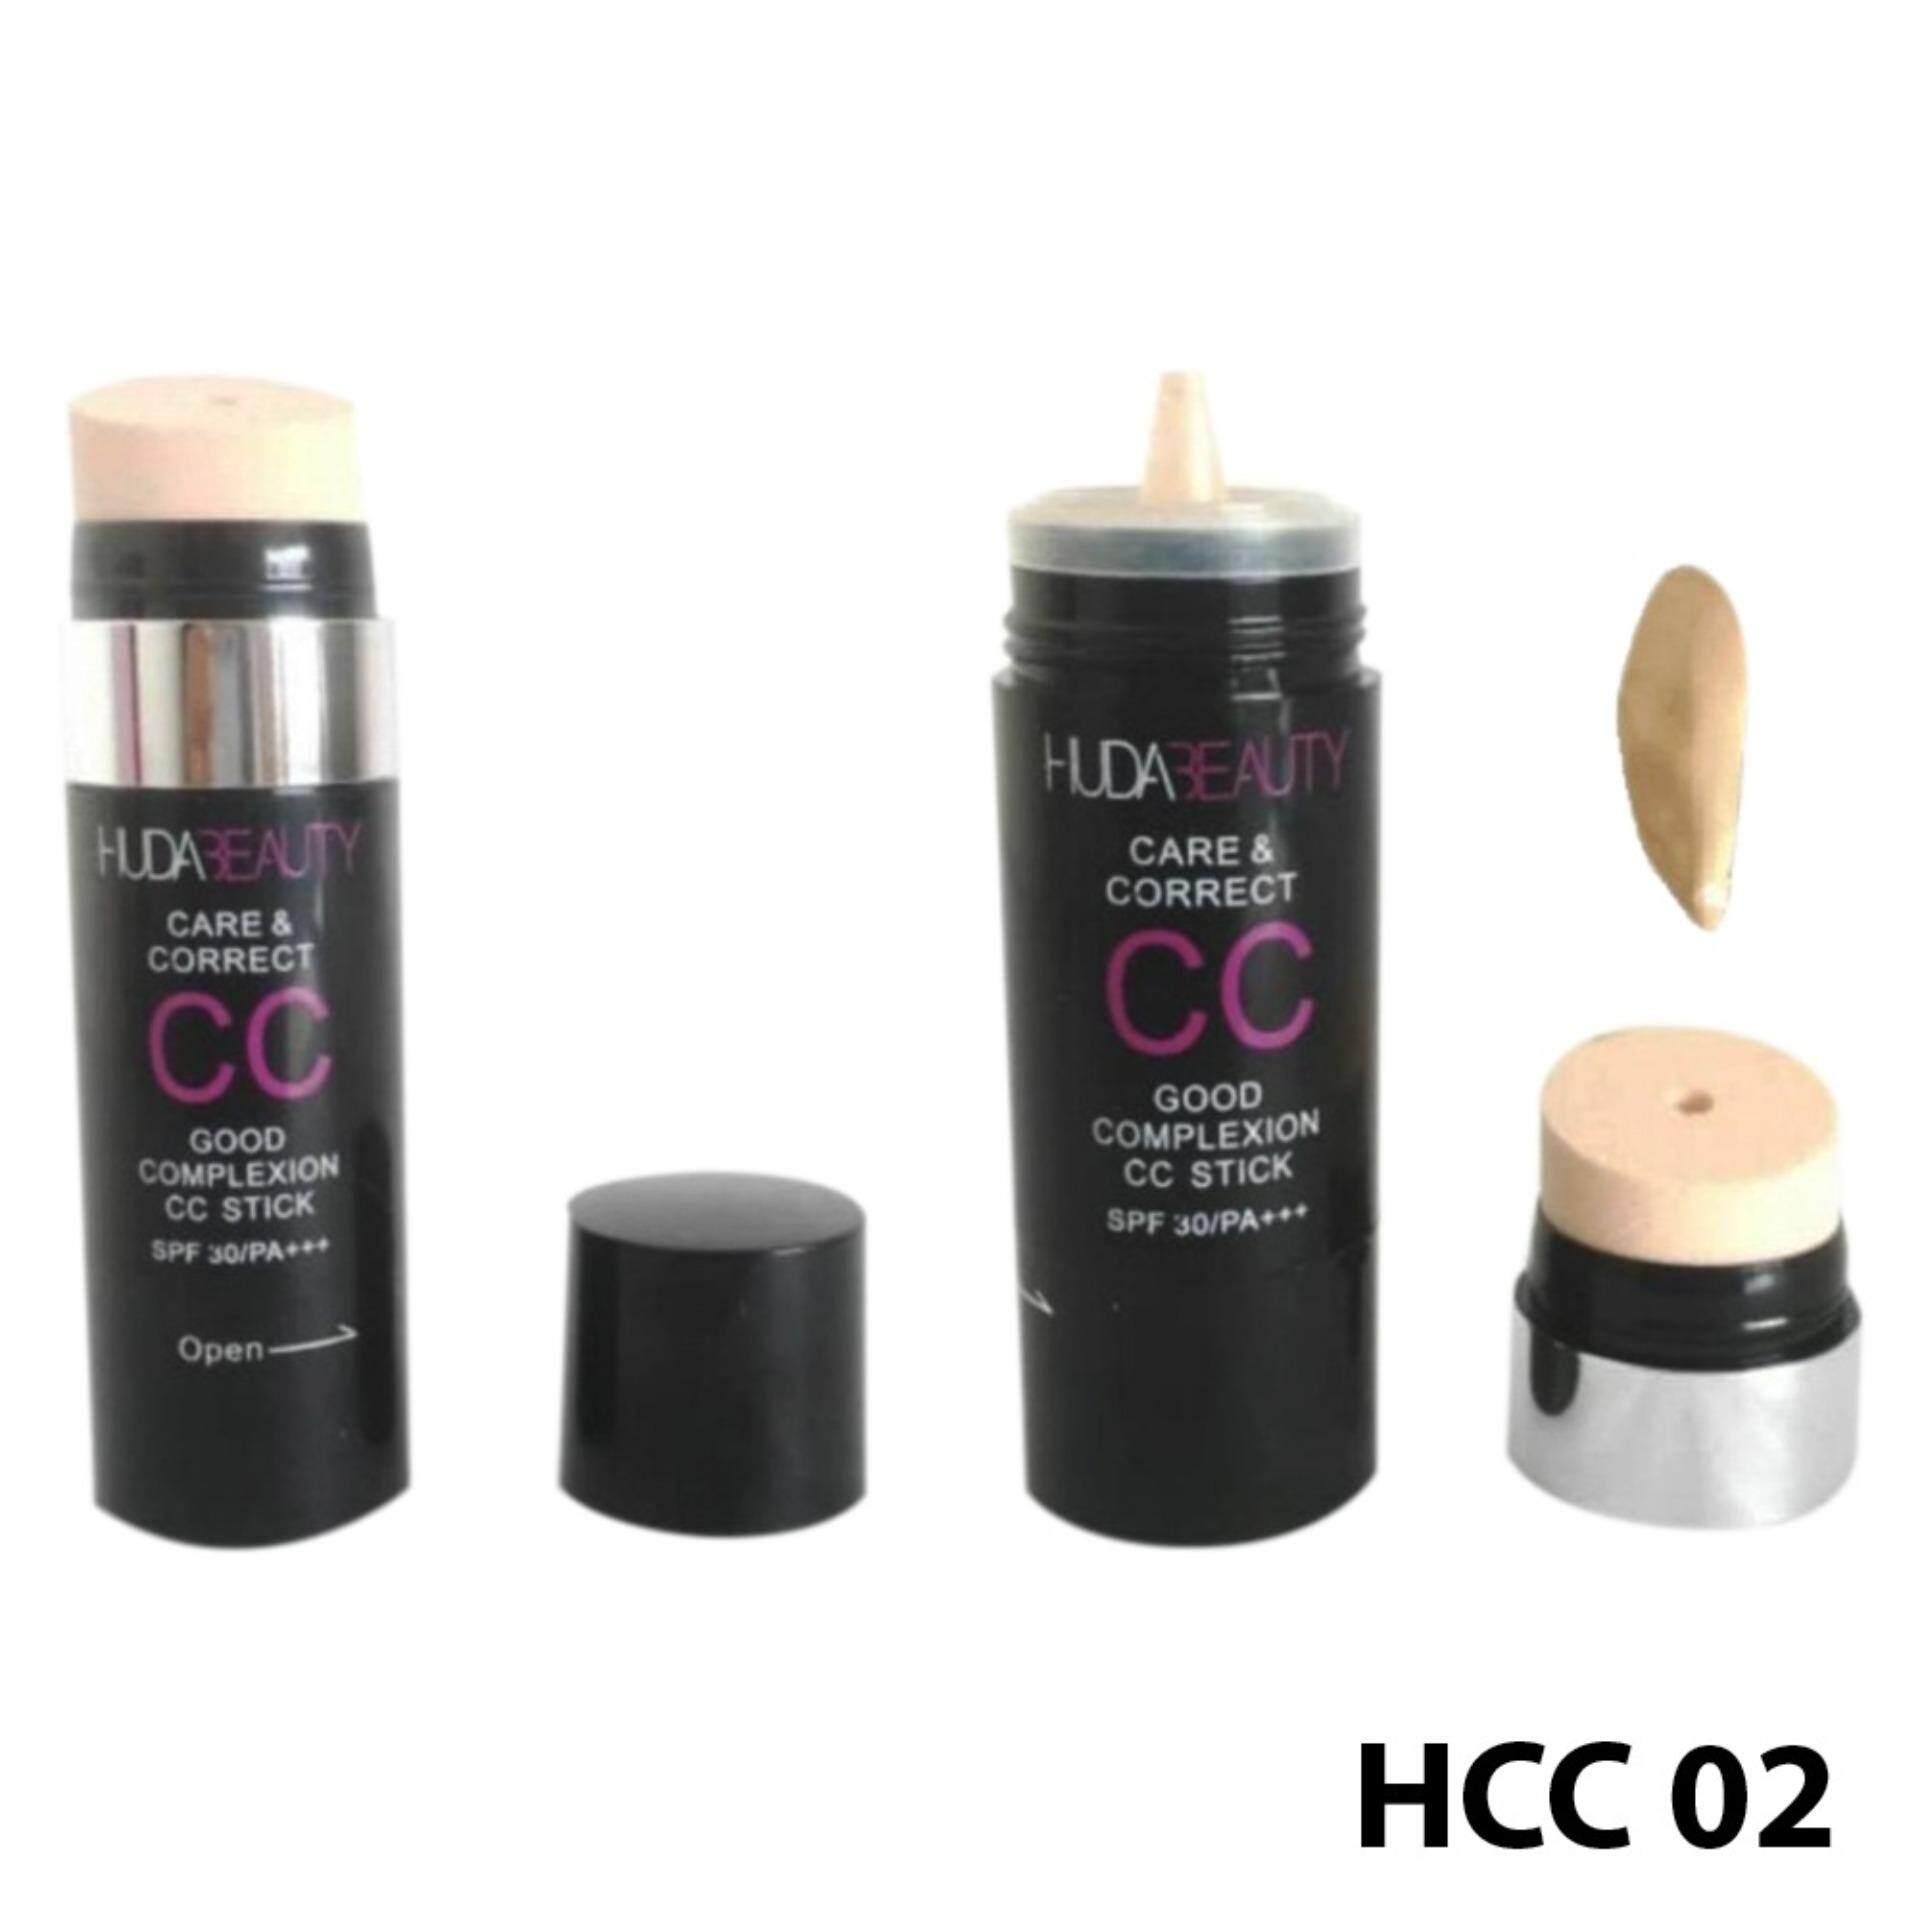 Branded Care & Corrector CC Foundation Stick Refillable SPF 30/PA +++ No. 02